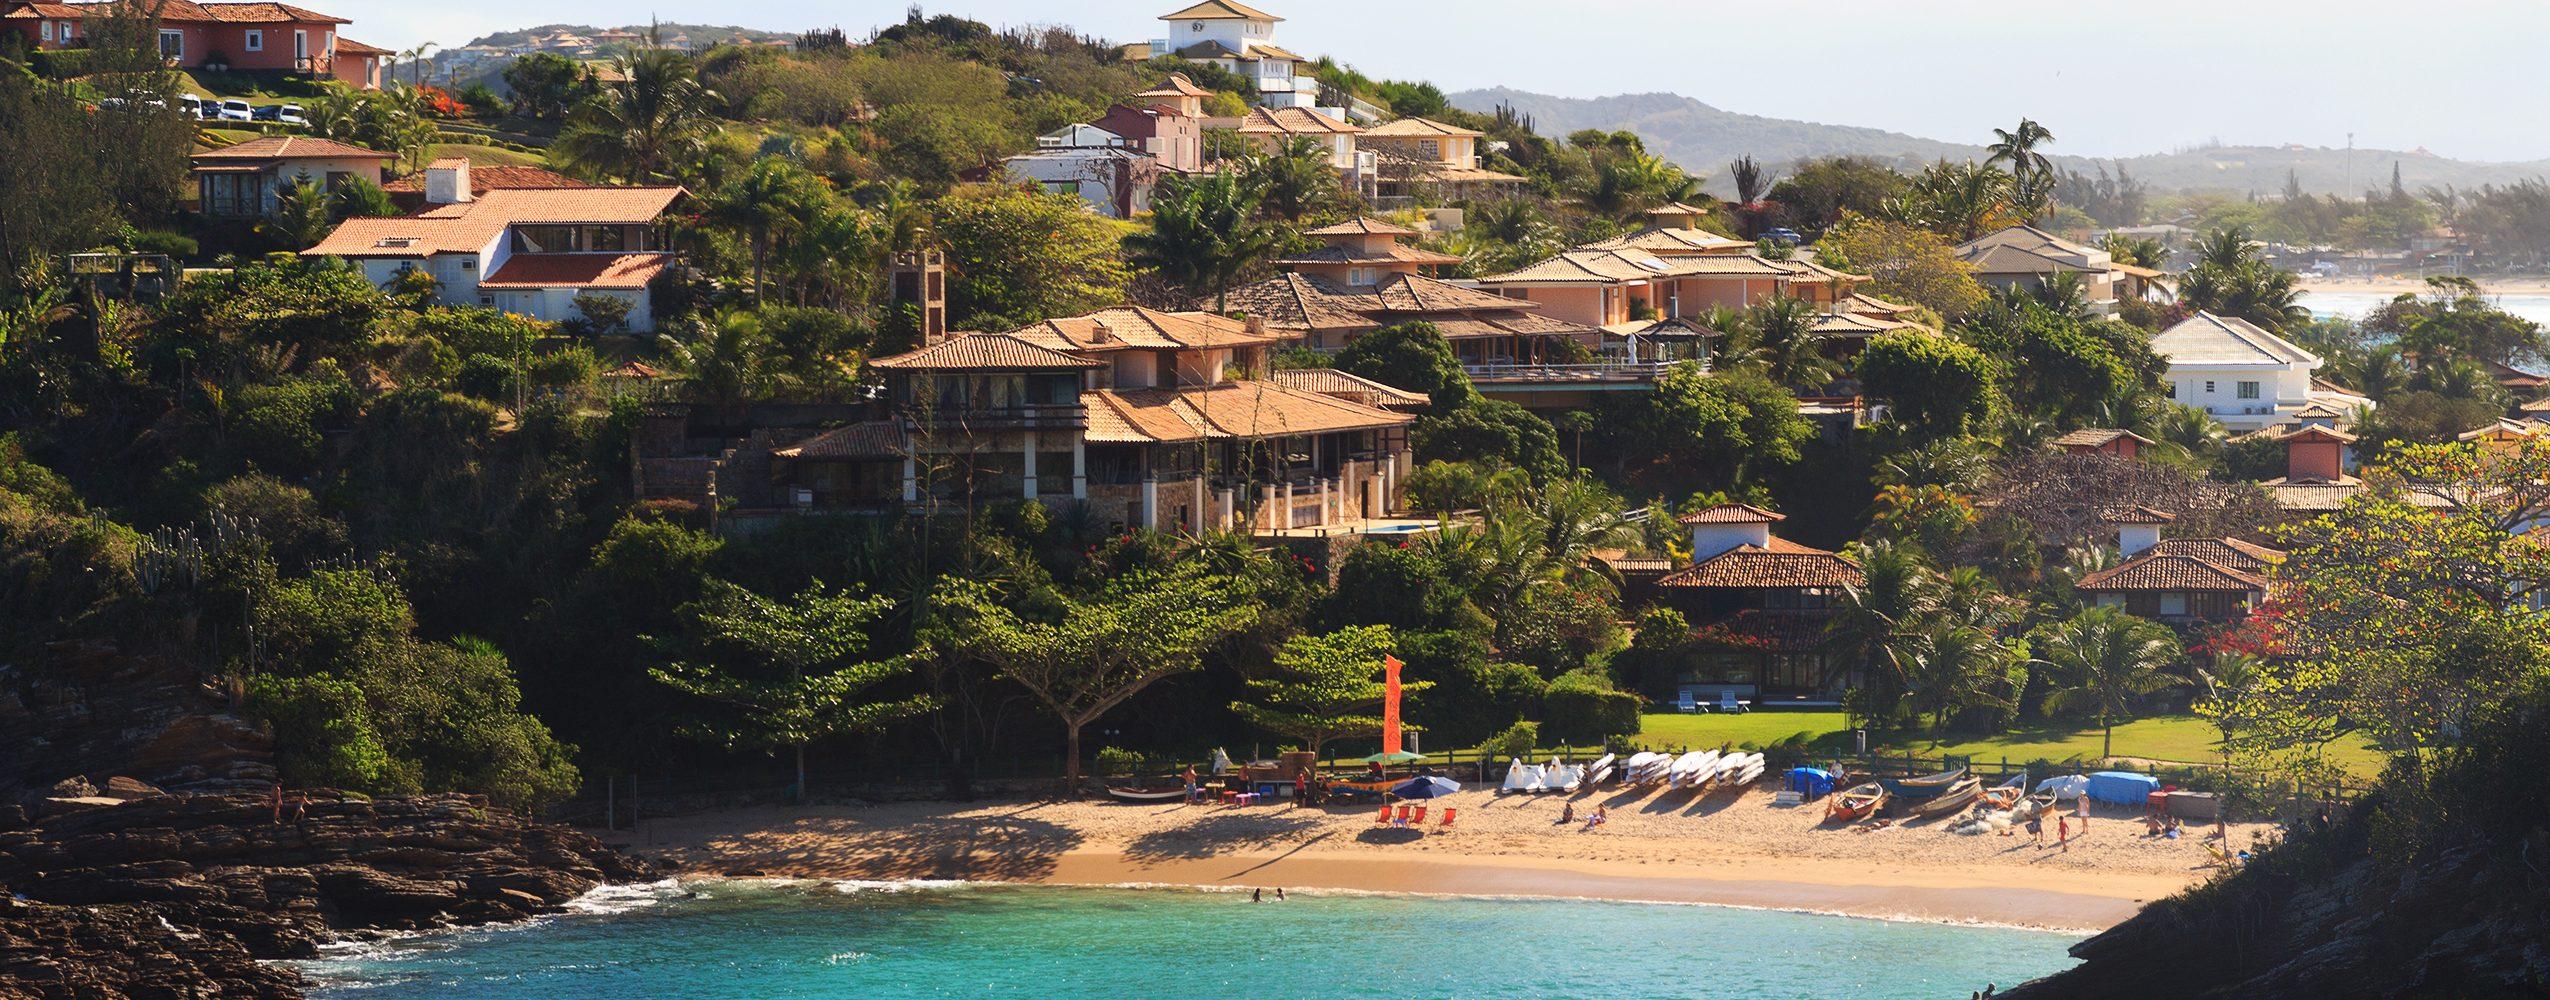 buzios seaside destination